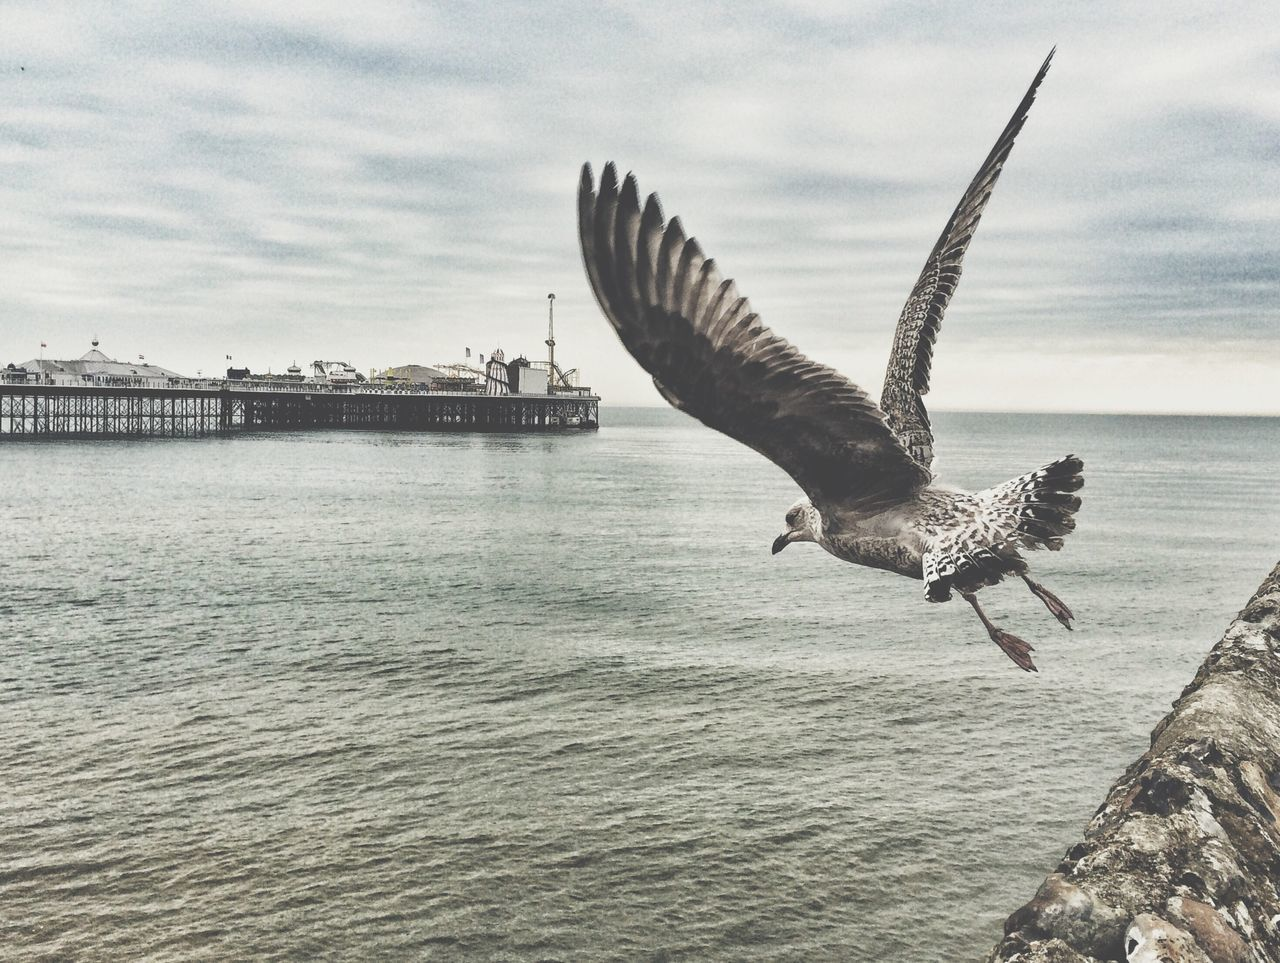 Animal Themes, Animals In The Wild, Bird, Brighton, Day